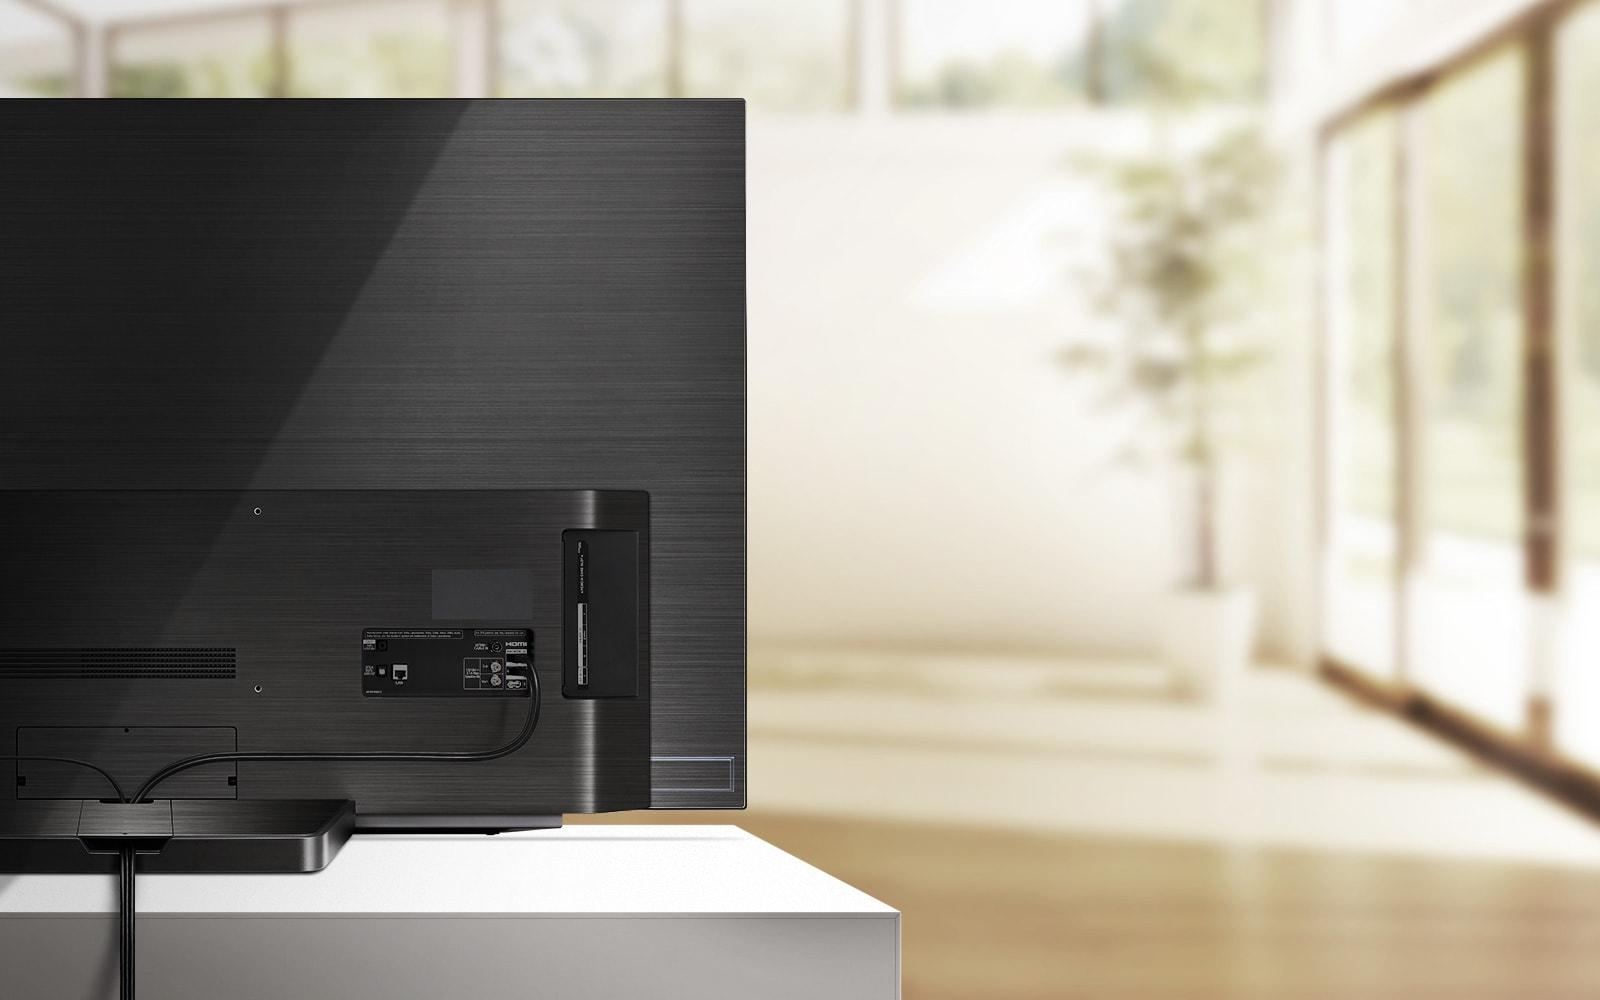 TV-OLED-C9-07-Cable-Management-Desktop